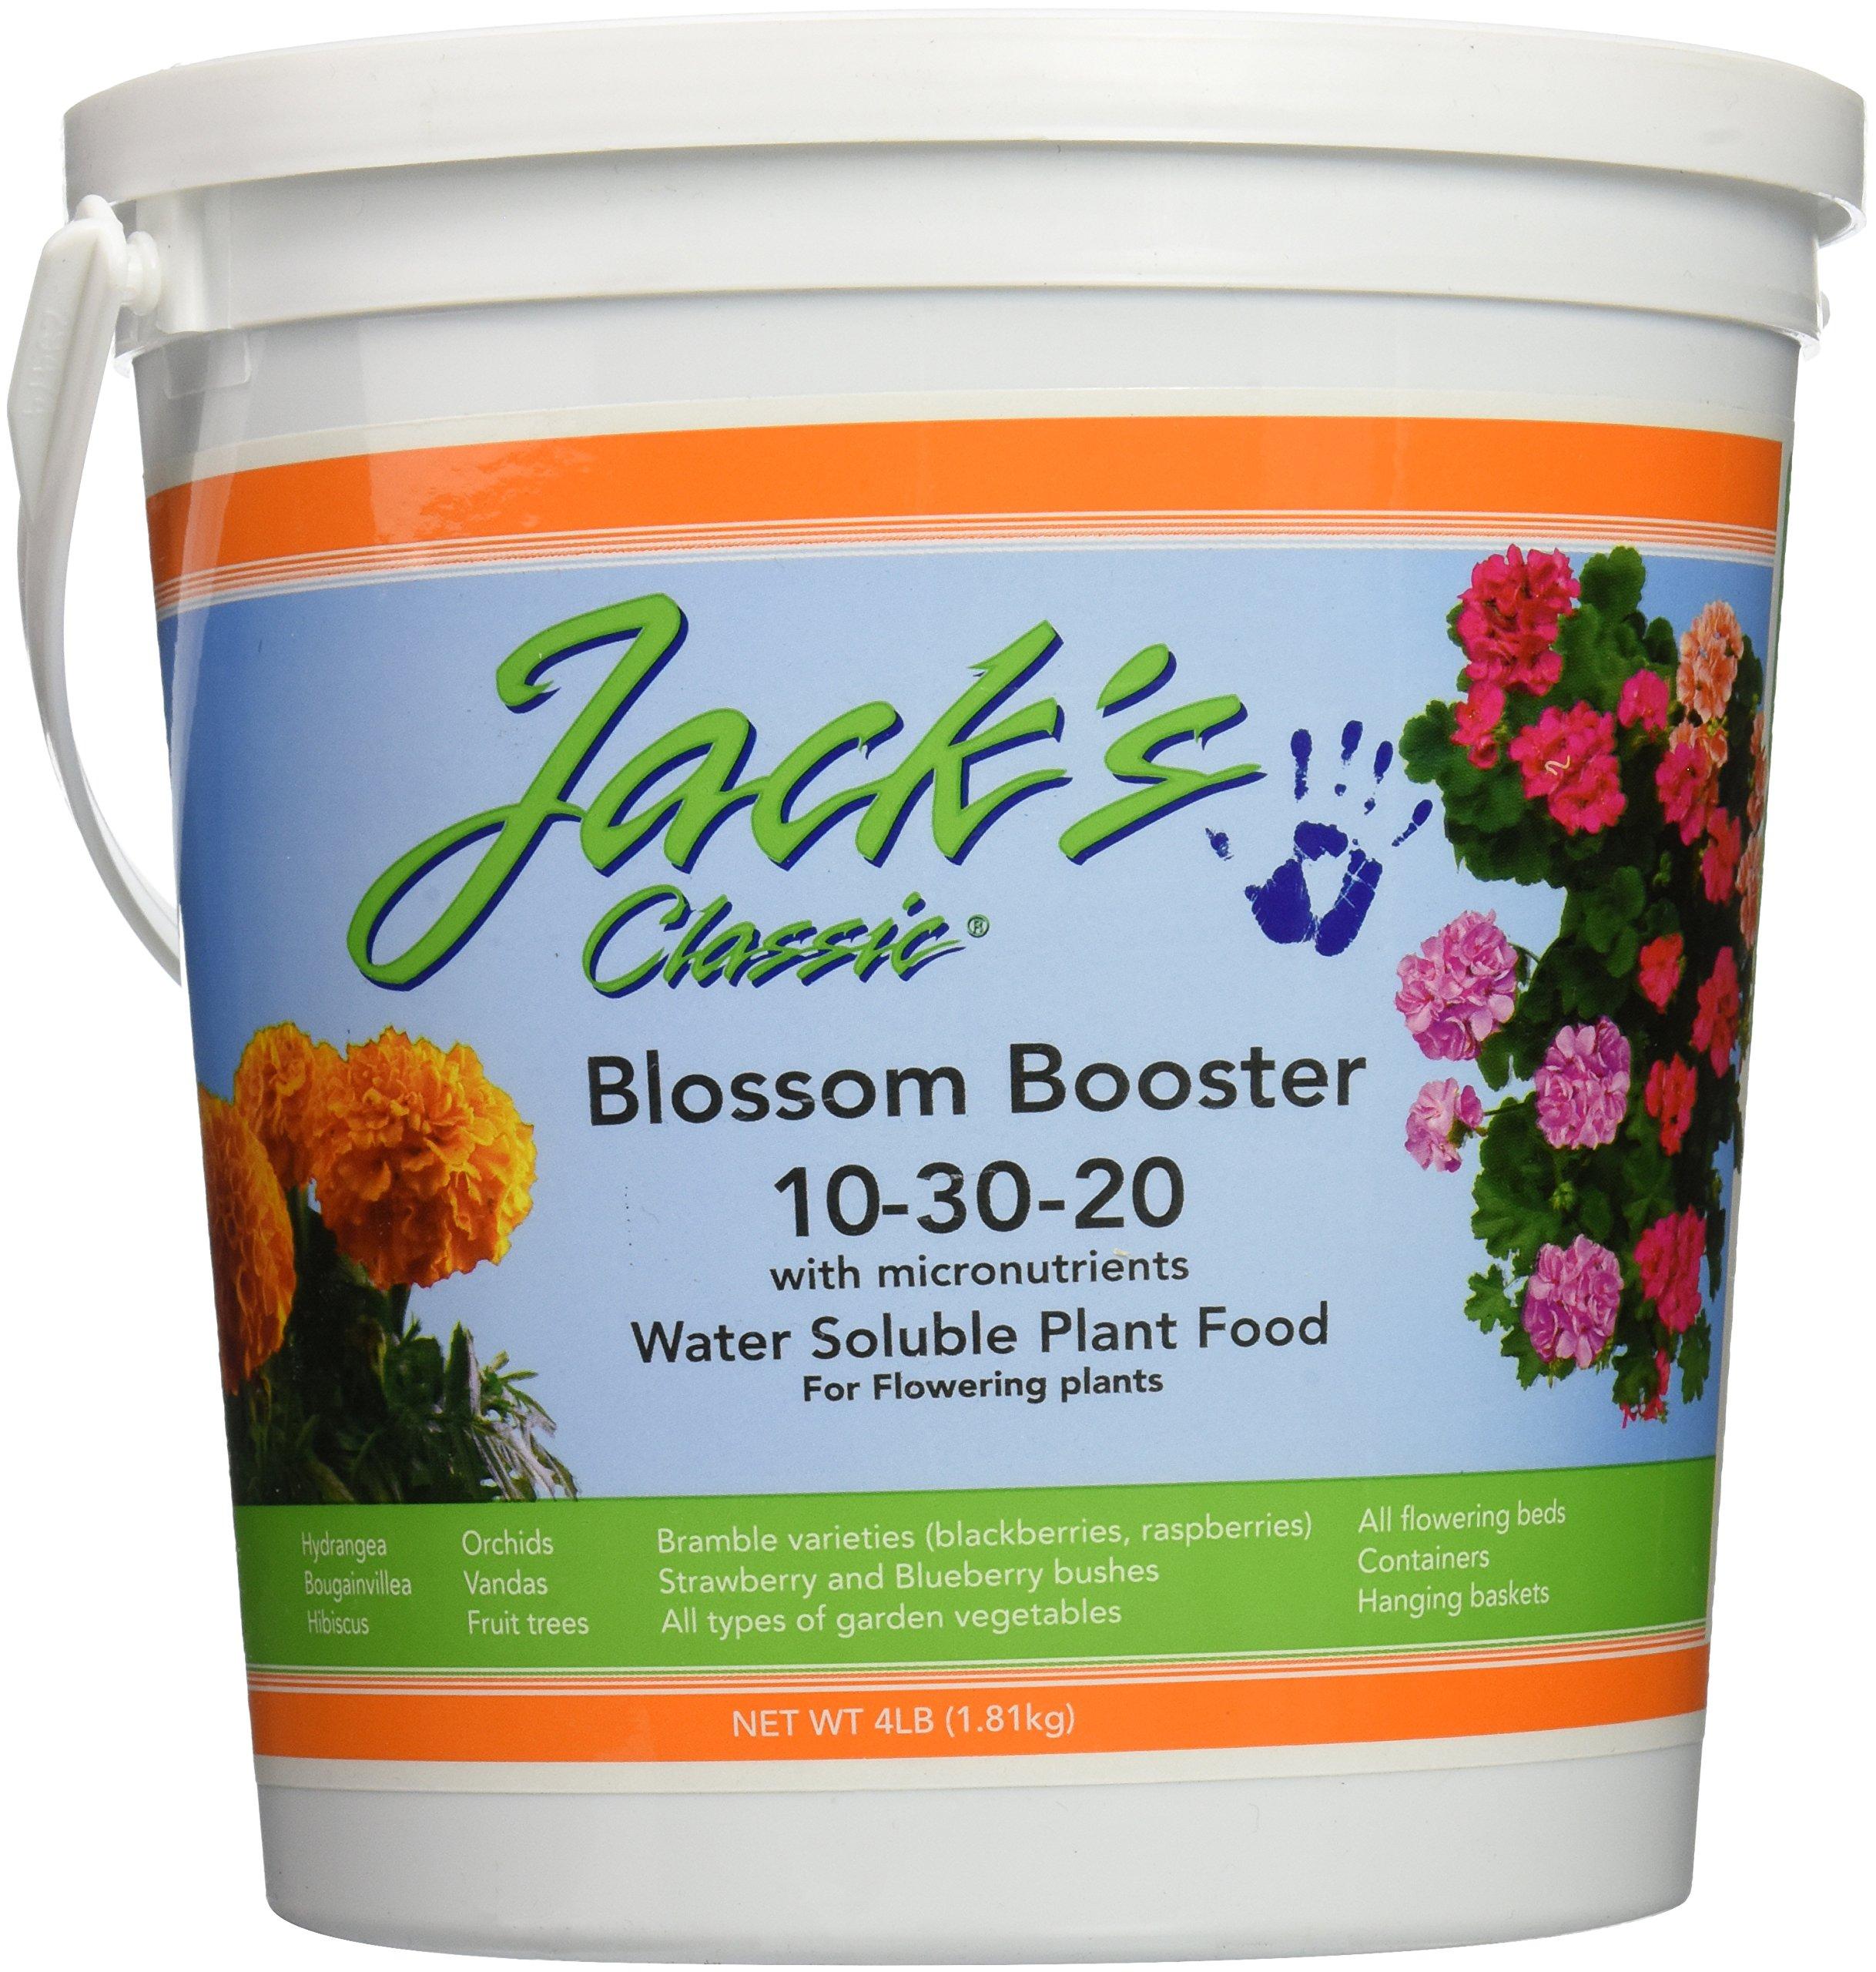 J R Peters Jacks Classic No.4 10-30-20 Blossom Booster Fertilizer